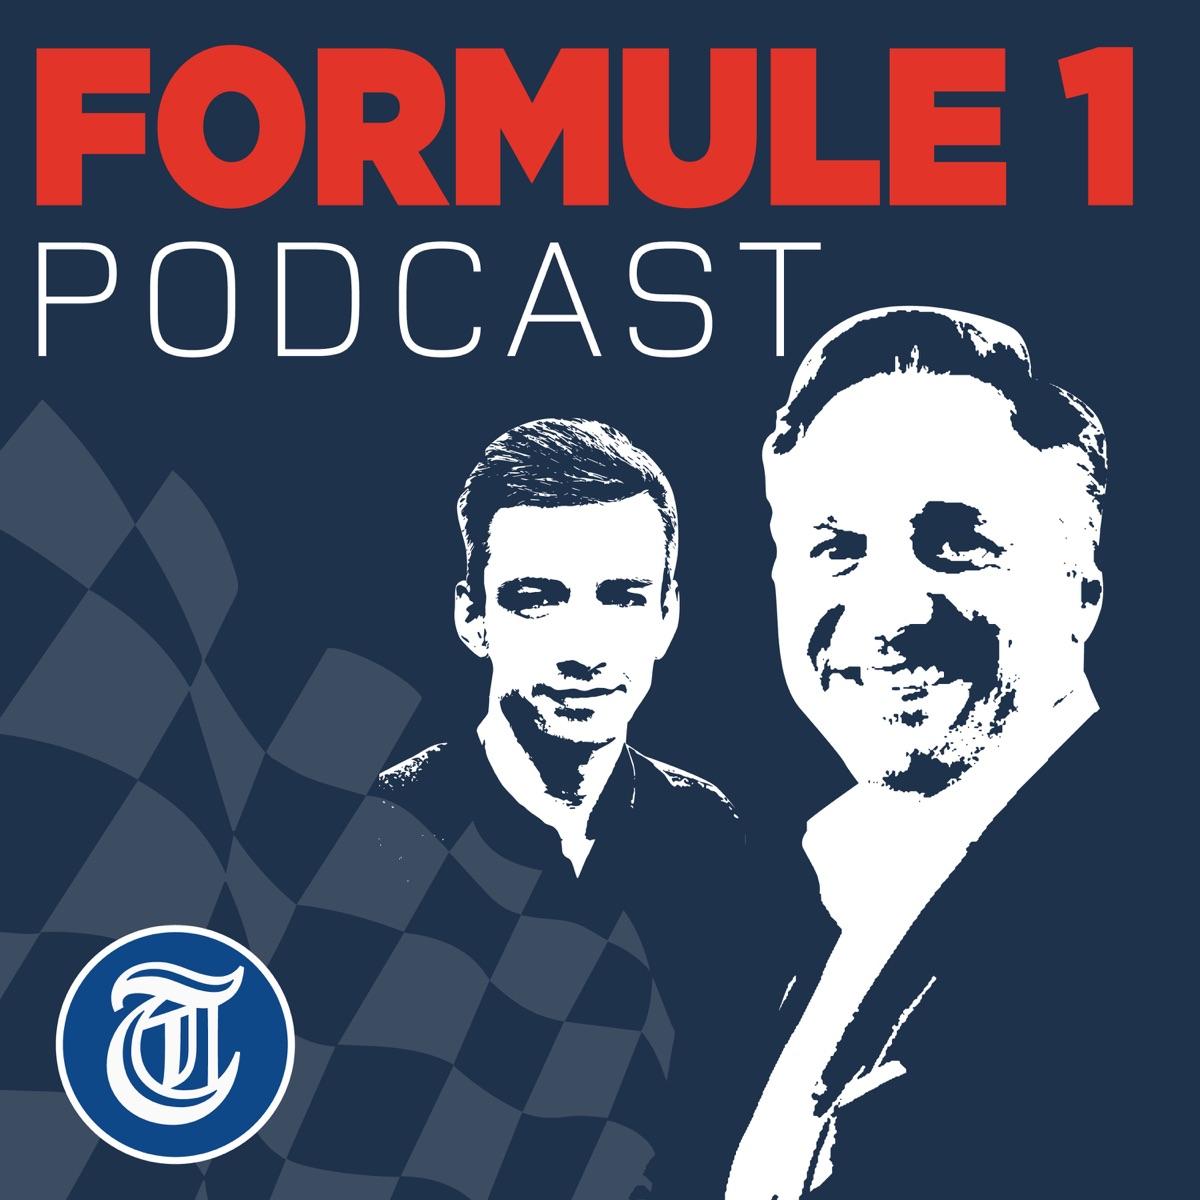 Telegraaf Formule 1 podcast